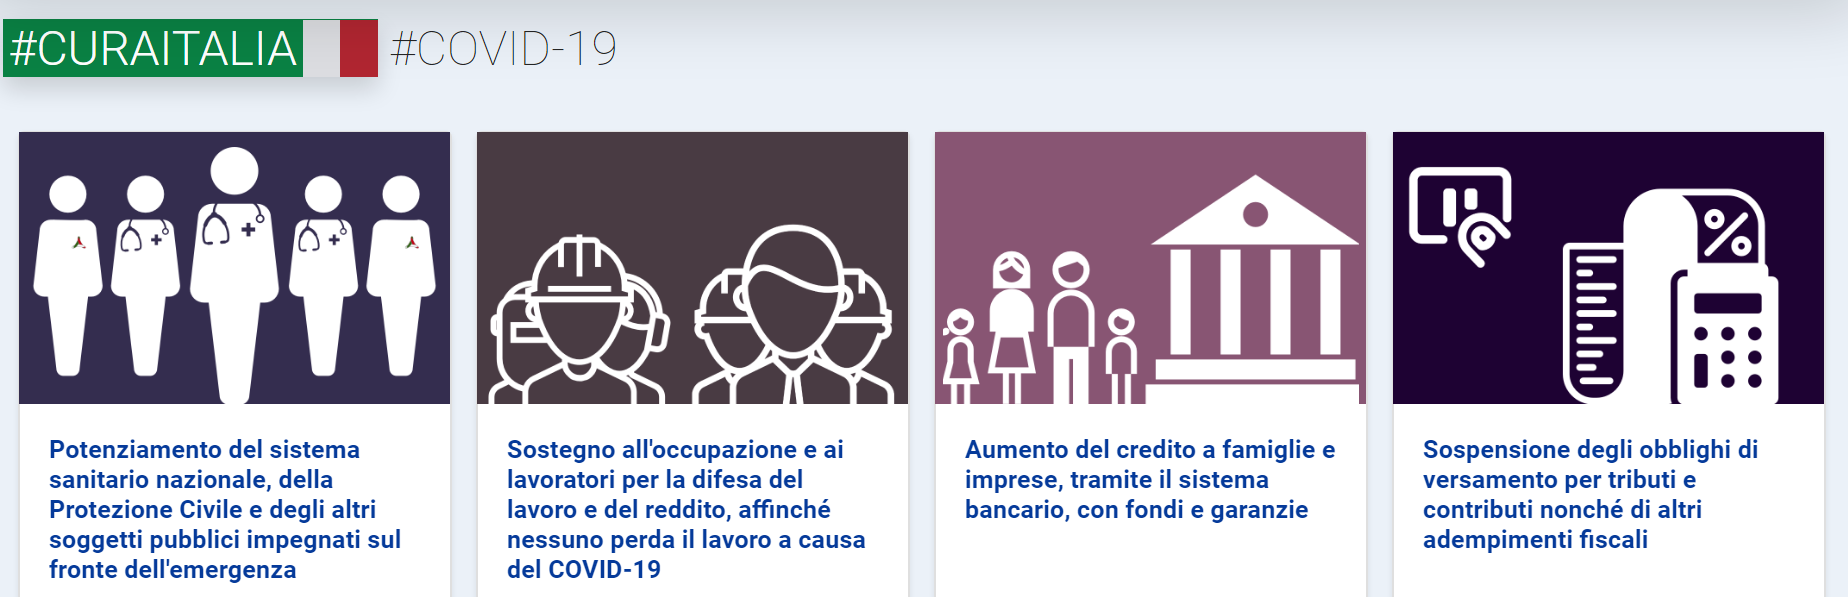 "CORONAVIRUS. Una sintesi del decreto ""Cura Italia"" in diverse lingue"